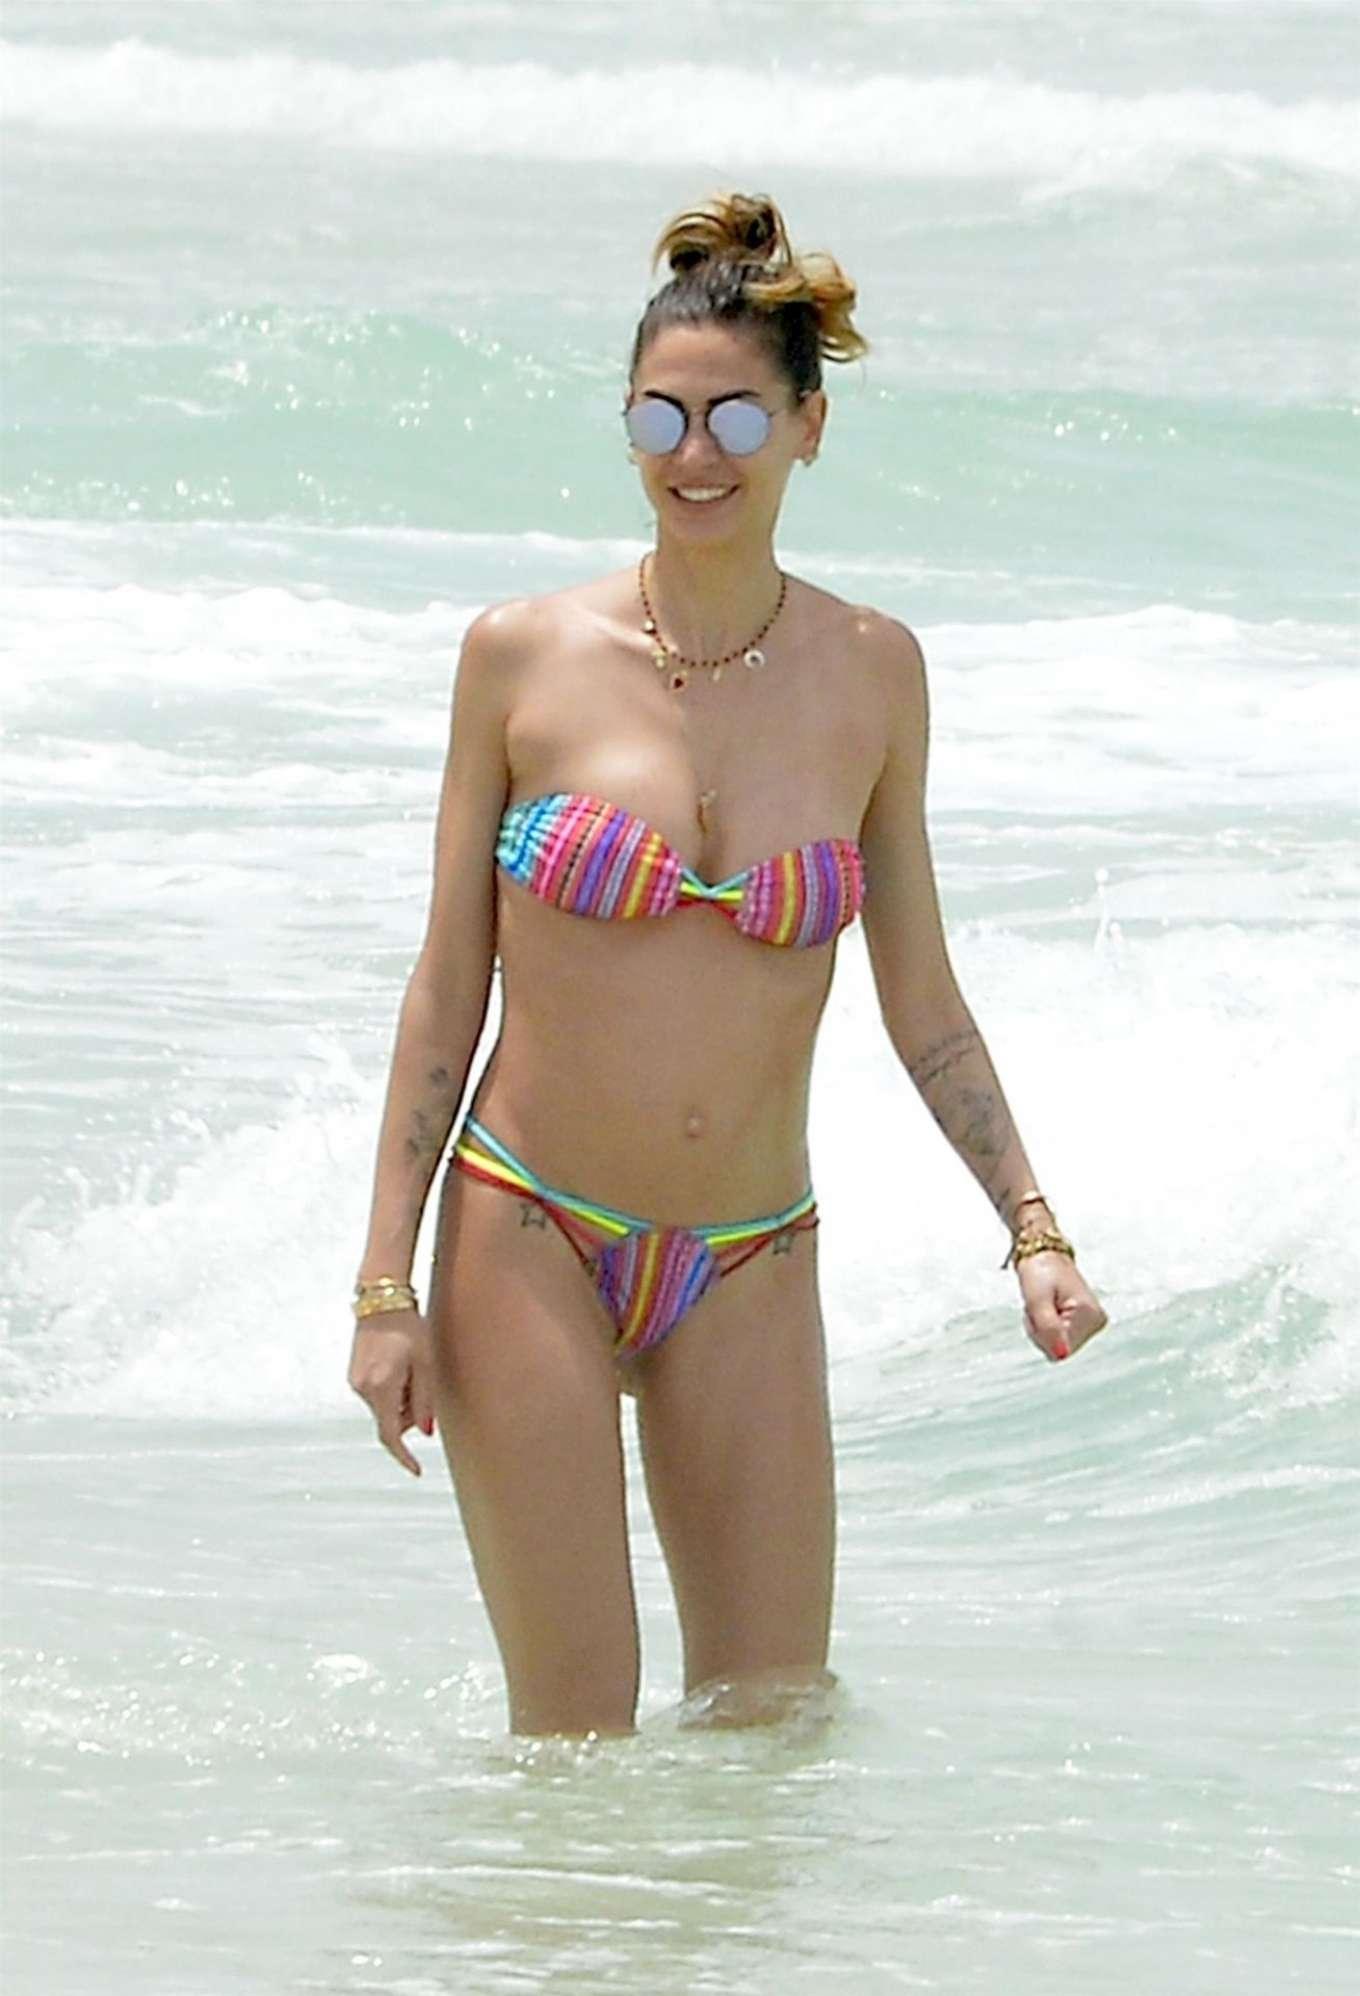 Melissa Satta in Bikini on the beach in Dubai